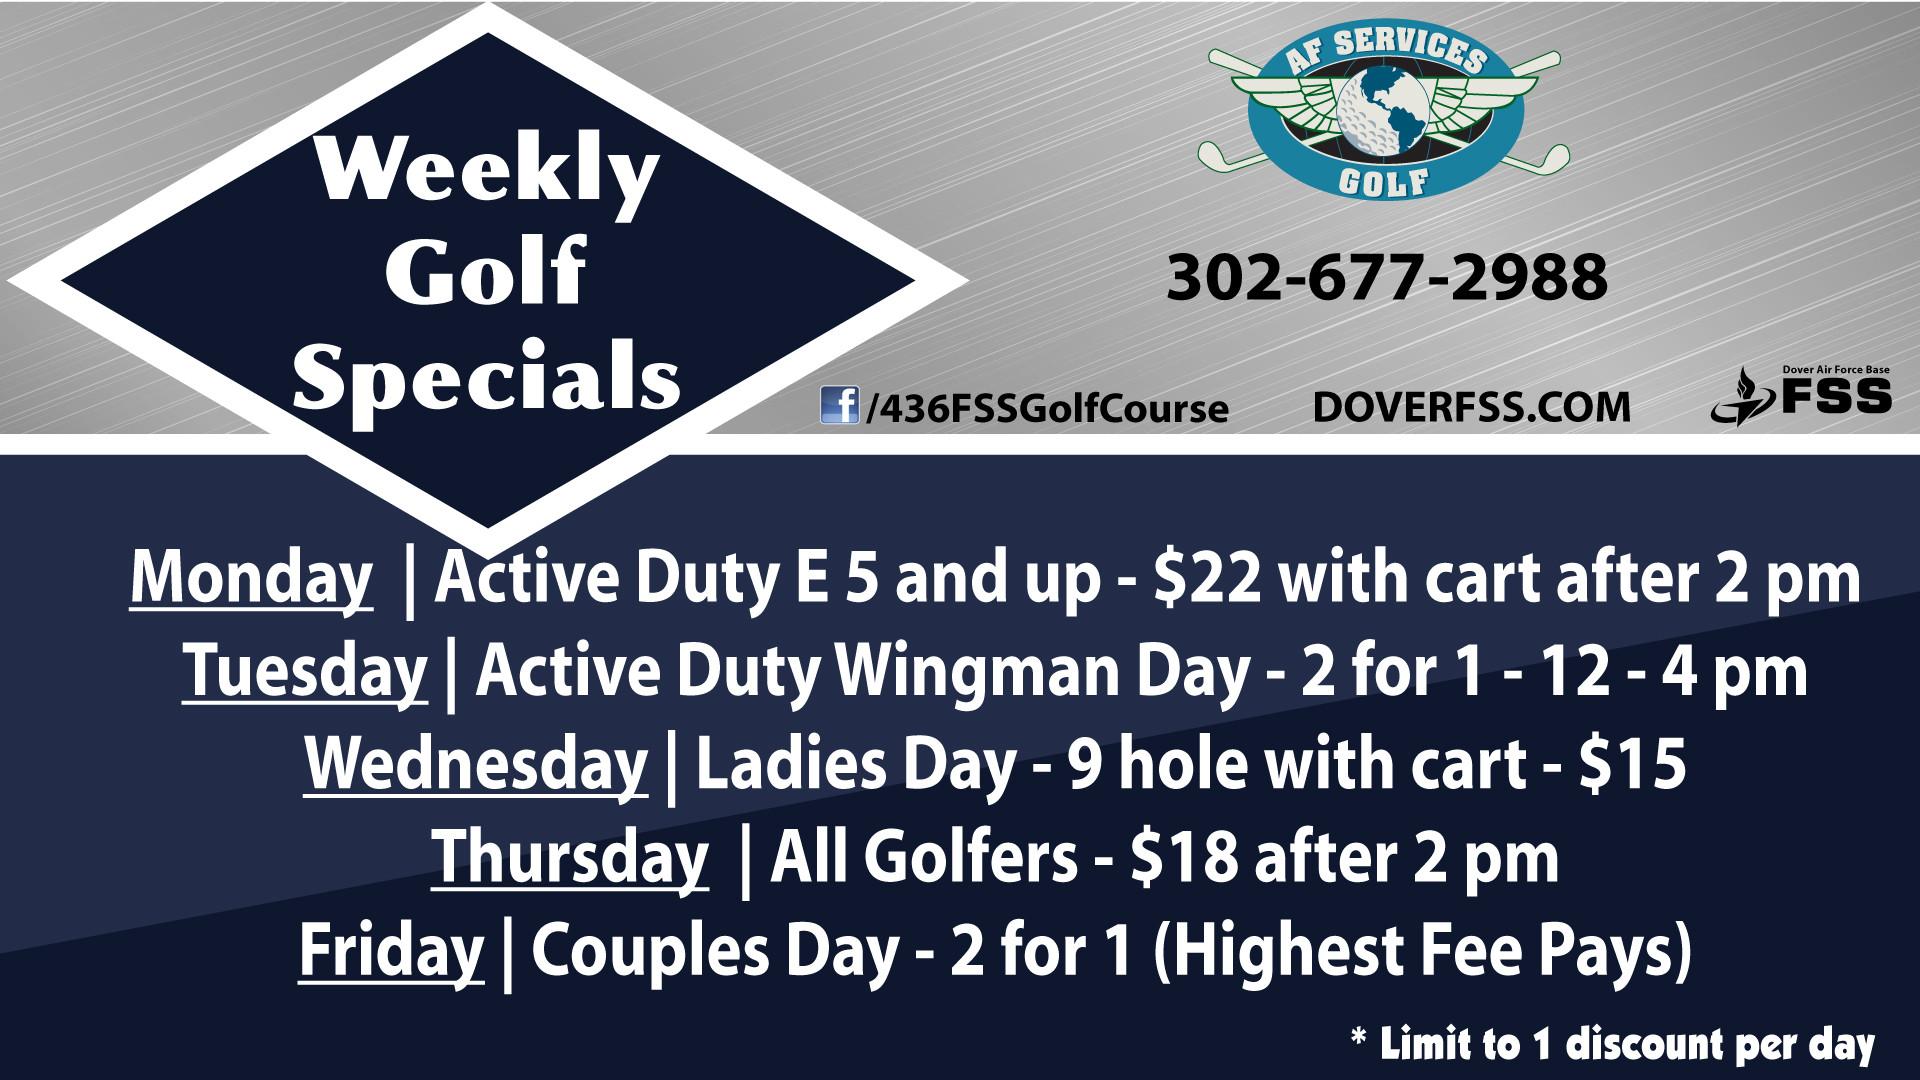 2021 Weekly Golf Specials